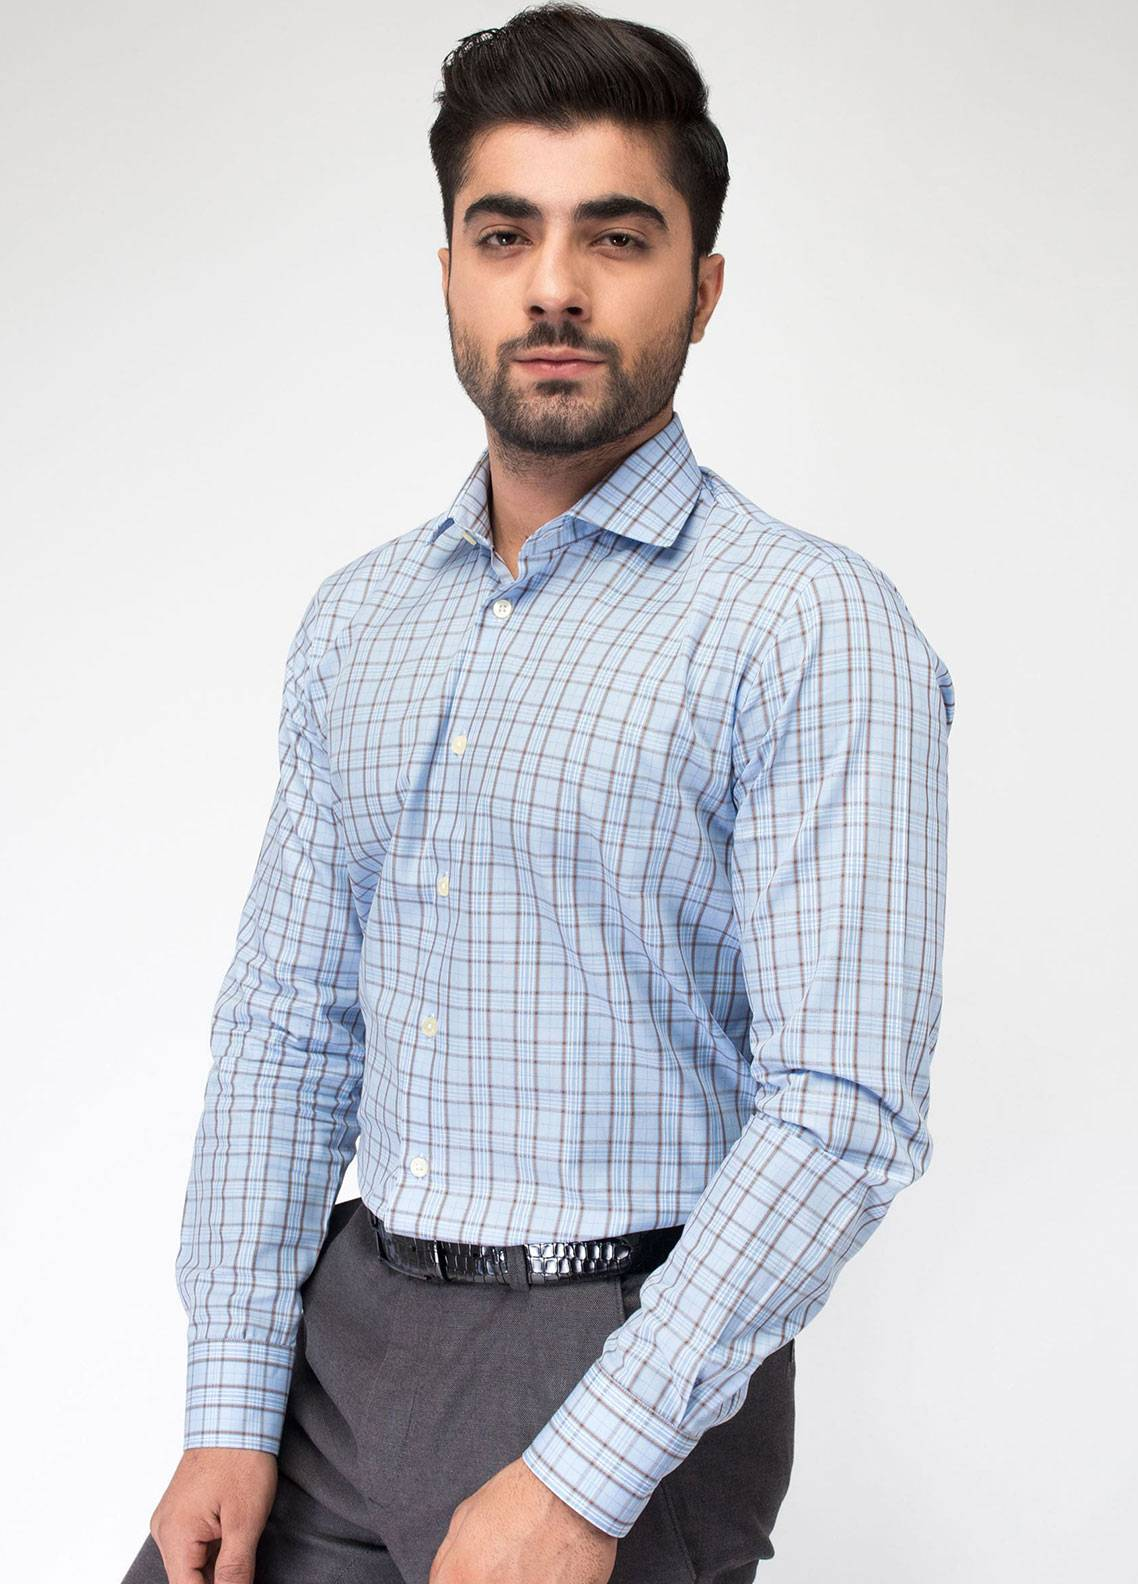 Brumano Cotton Formal Men Shirts - Blue BRM-773